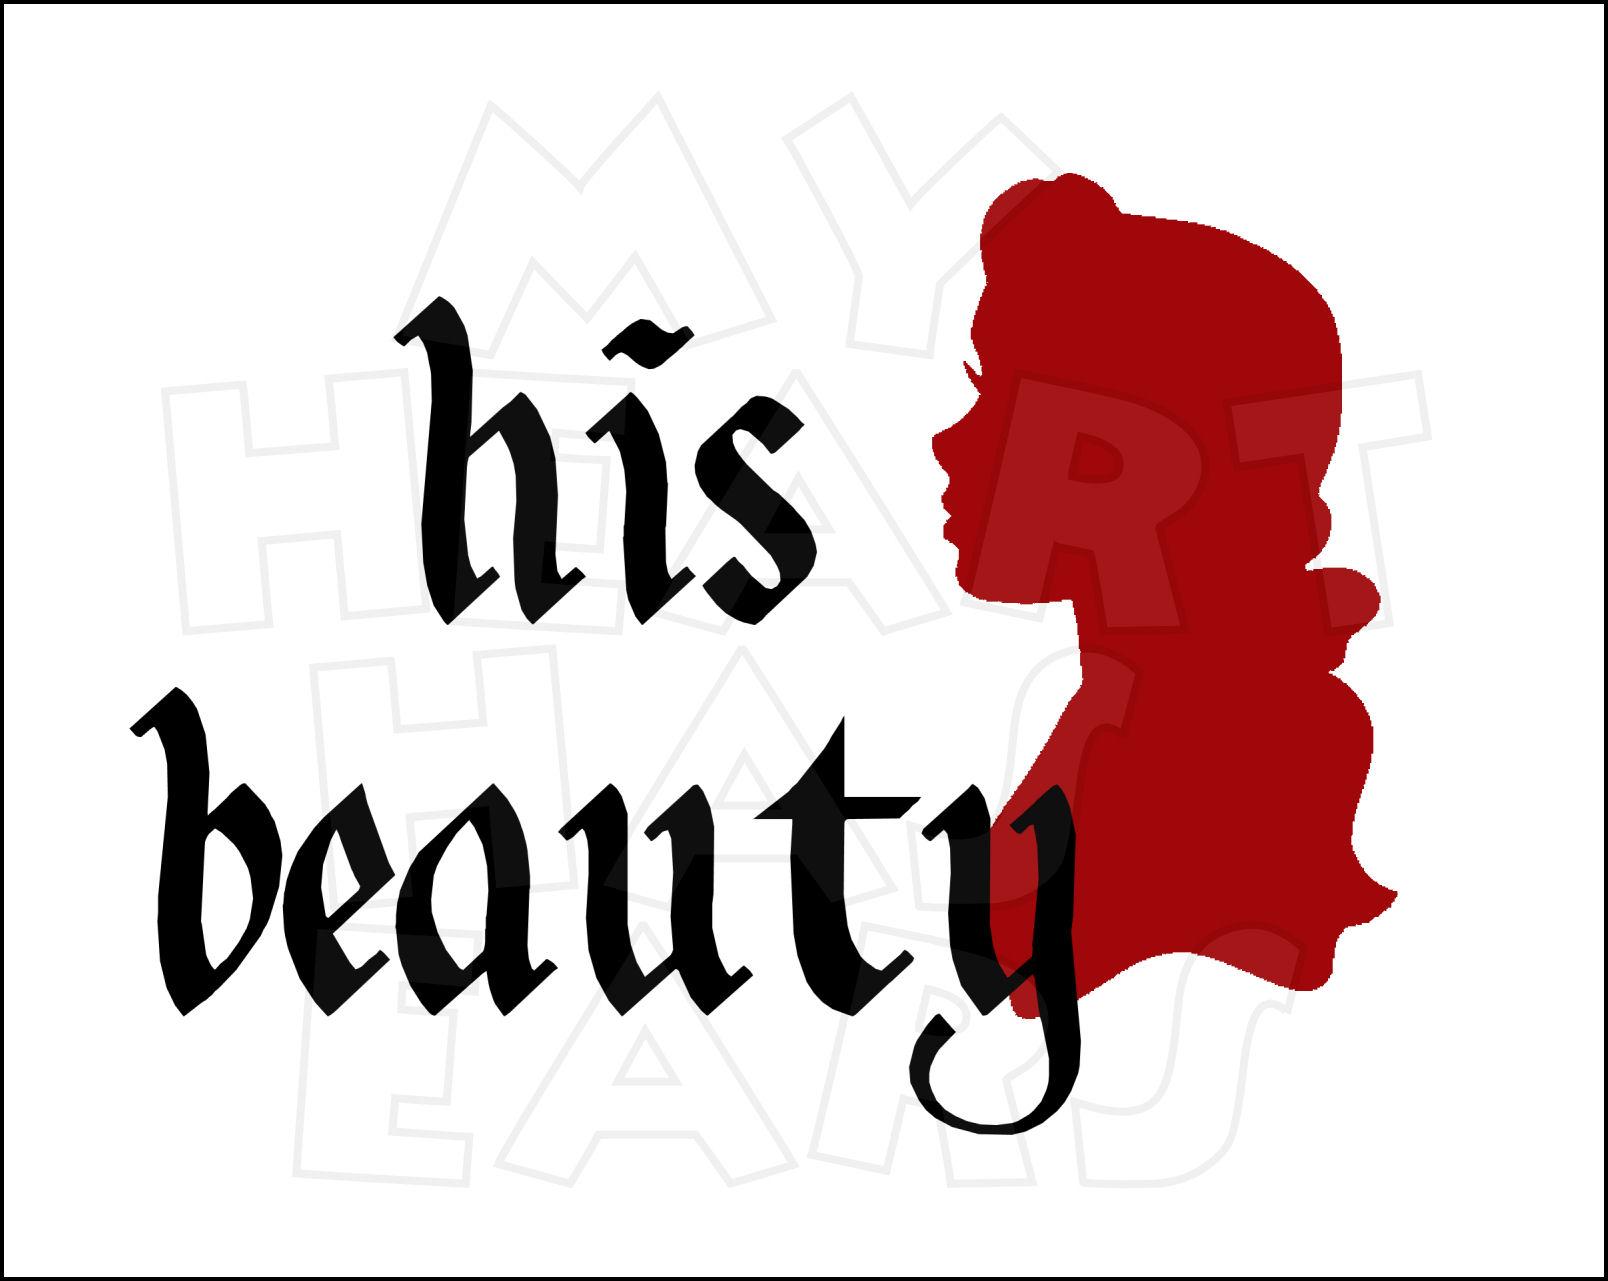 1608x1281 Beauty Amp The Beast My Heart Has Ears